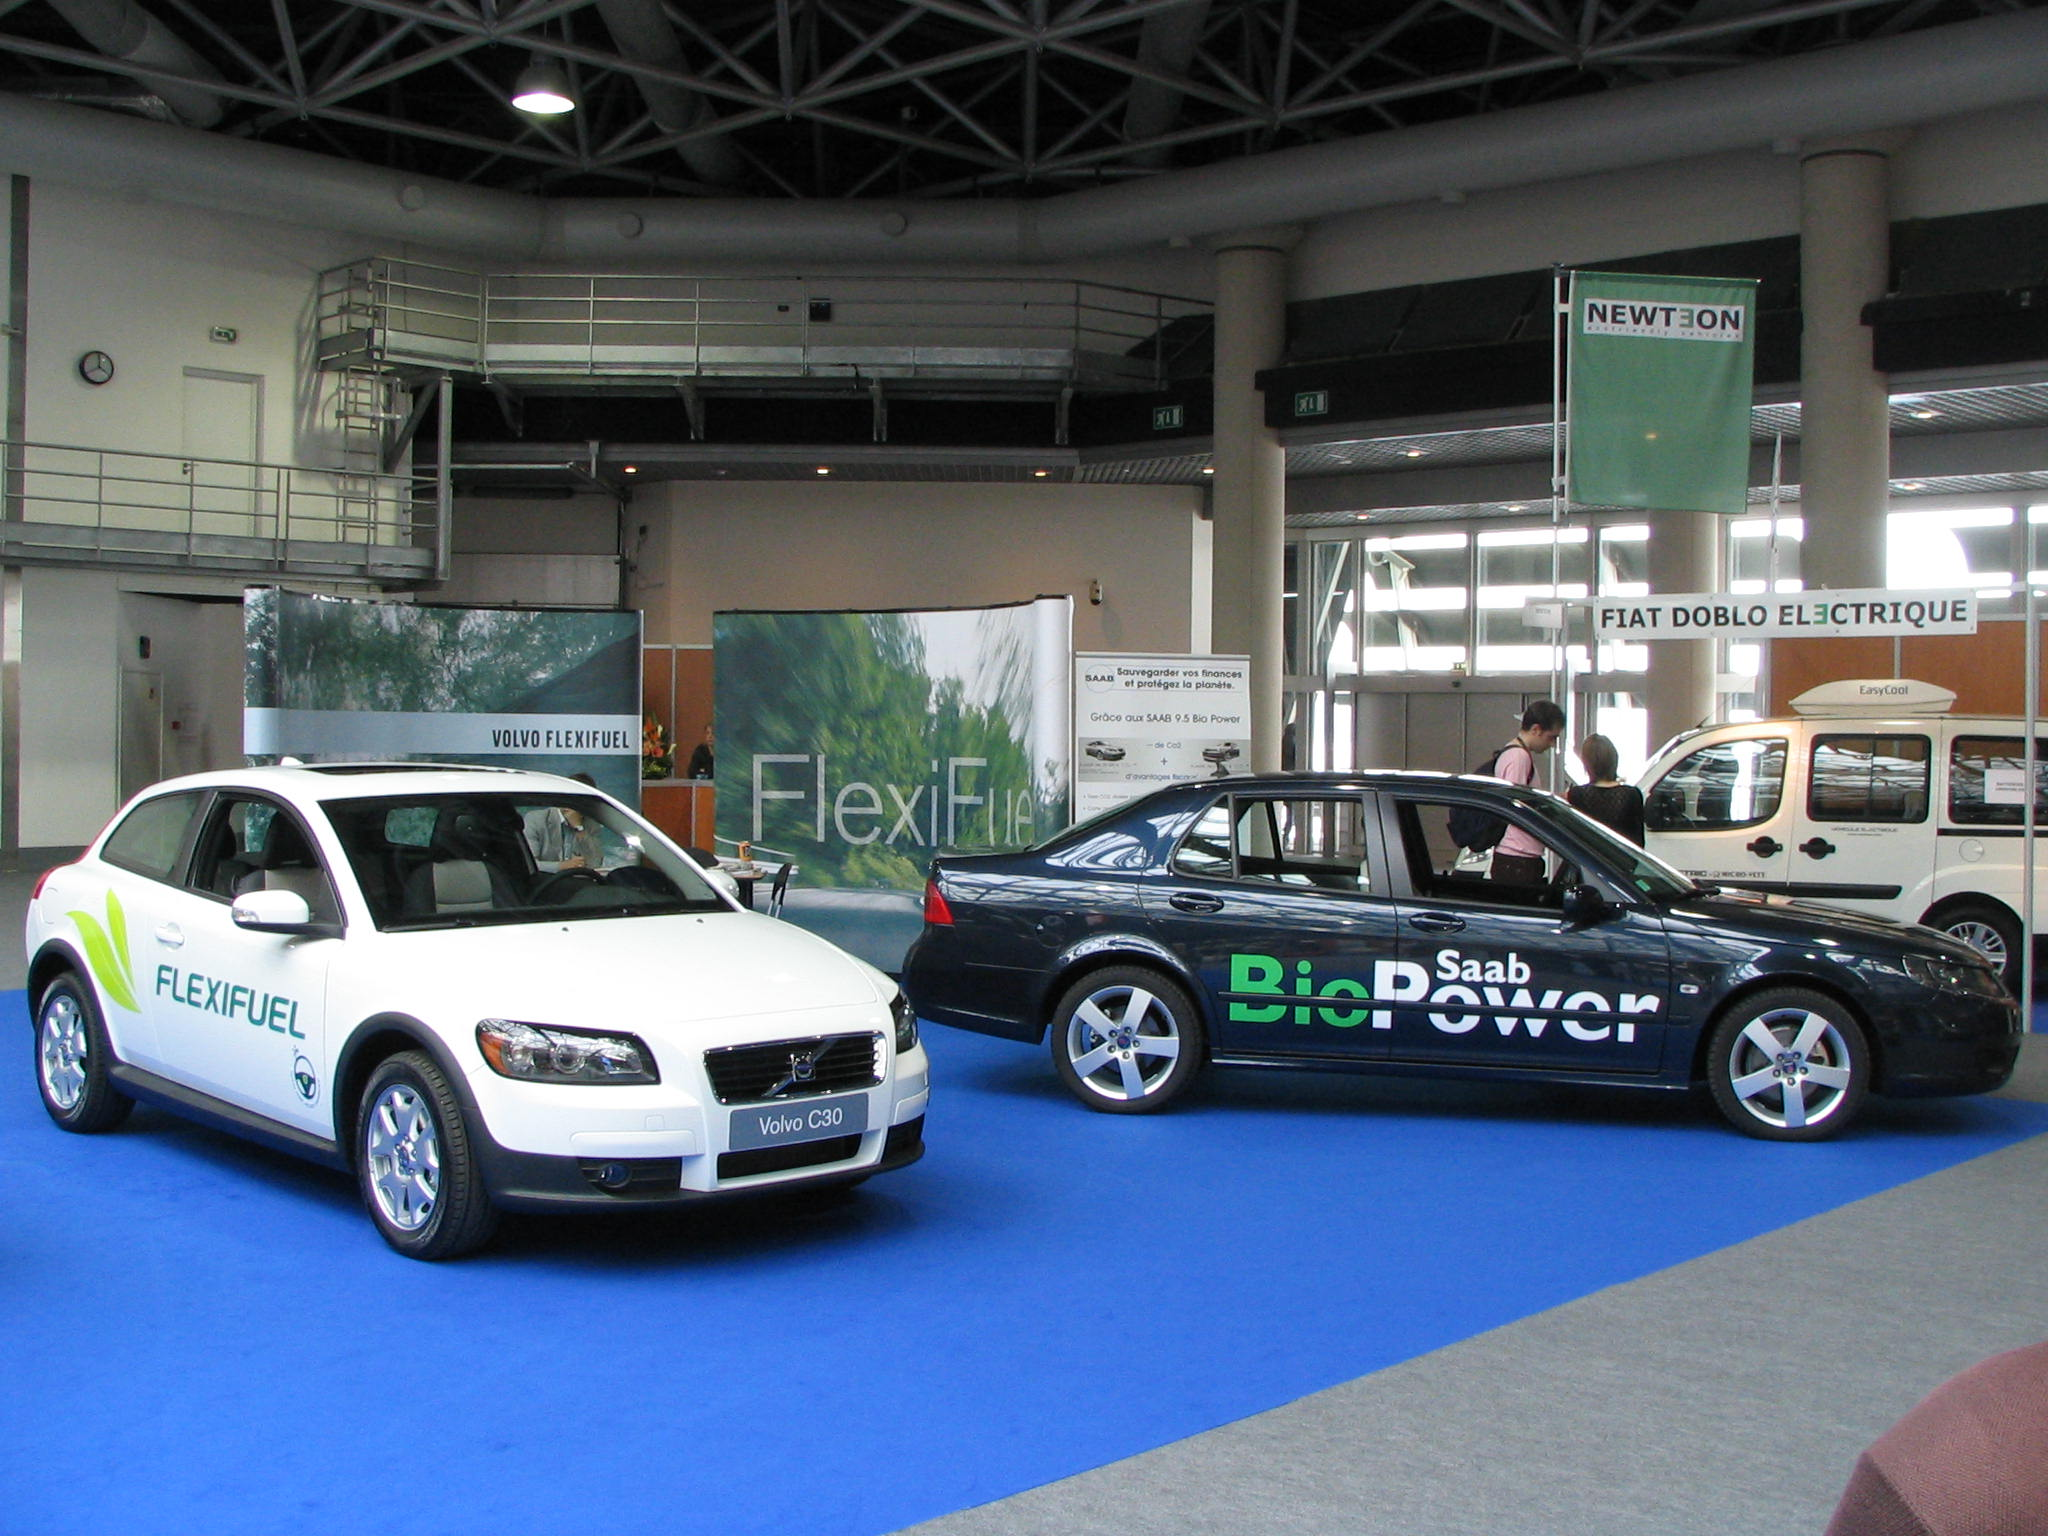 Saab Volvo with Ethanol